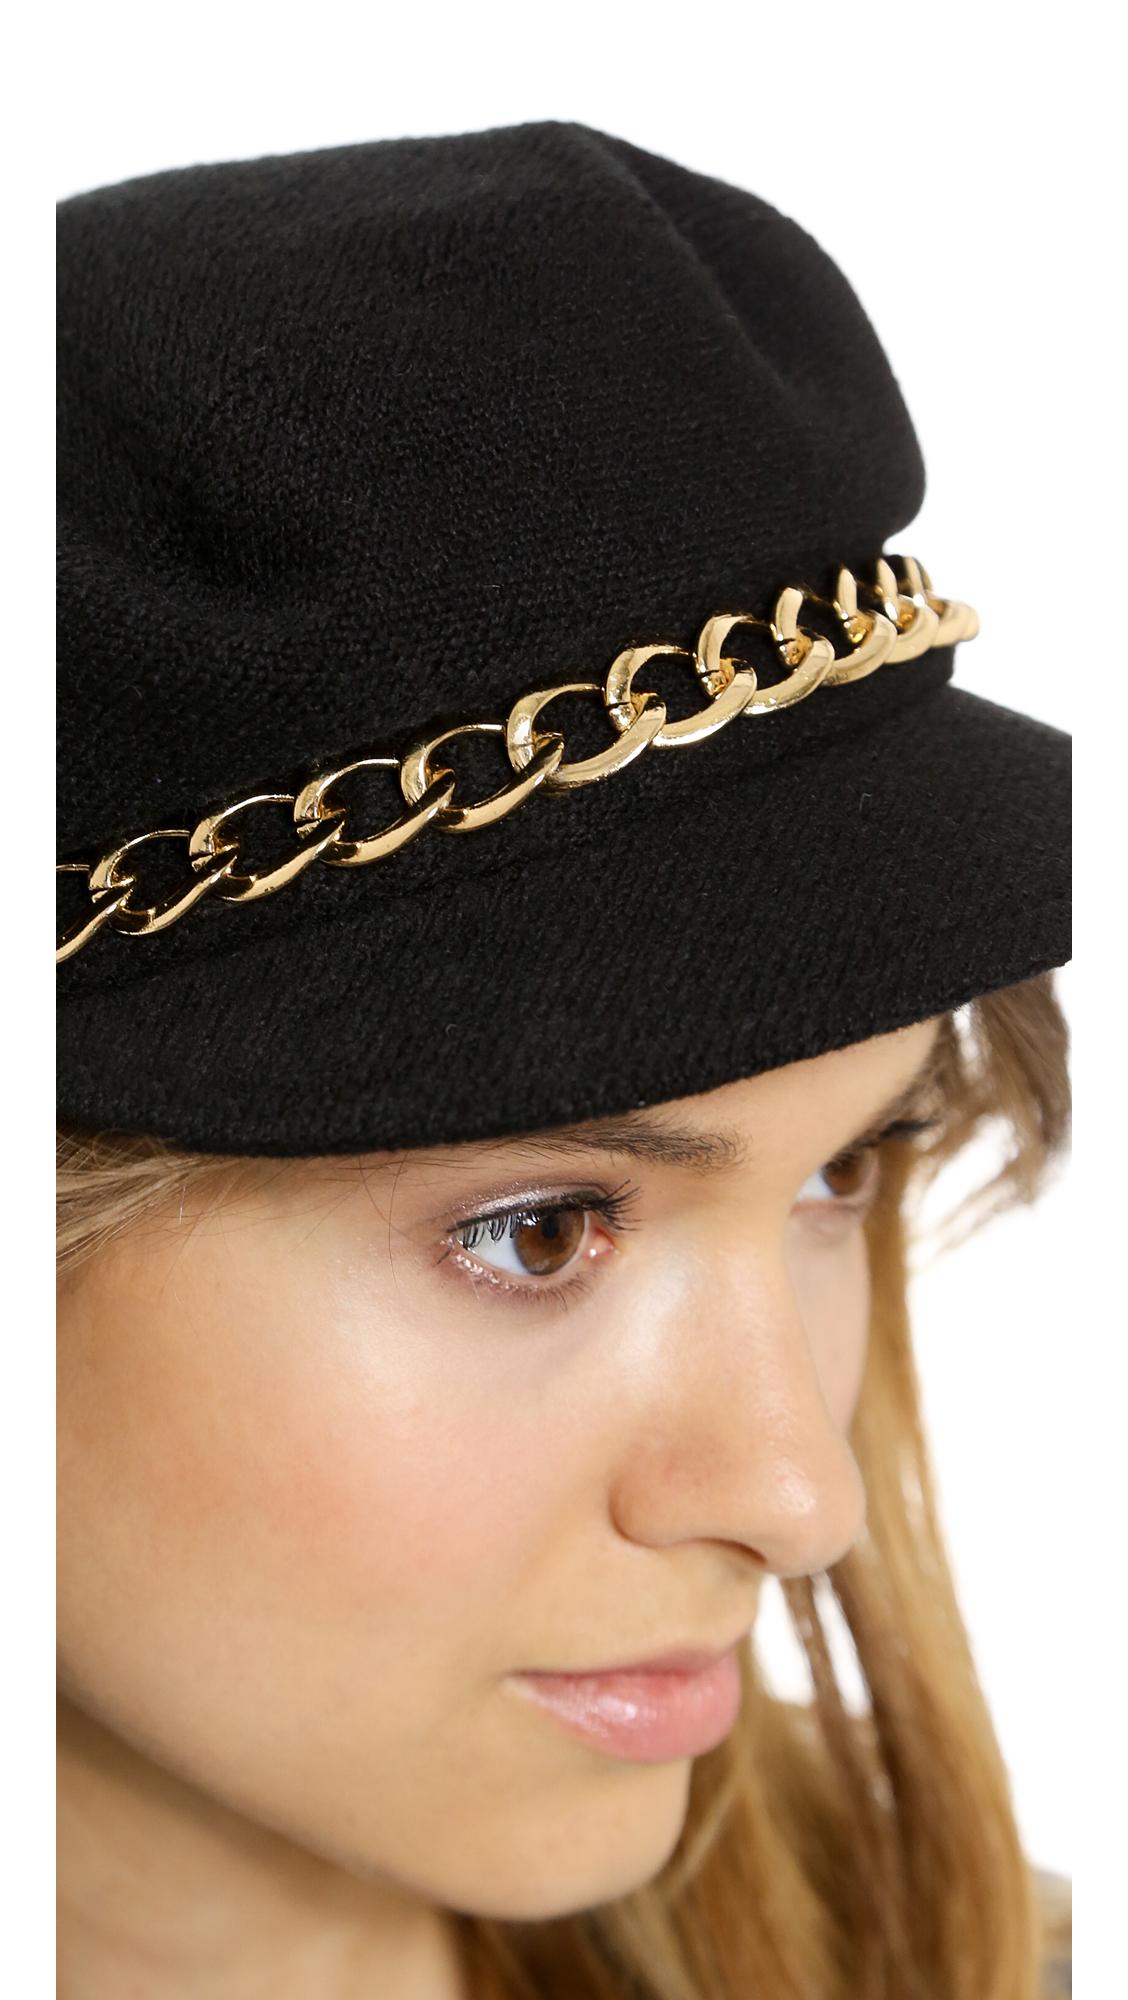 6e63e0be90f7c Eugenia Kim Marina Hat - Black in Black - Lyst